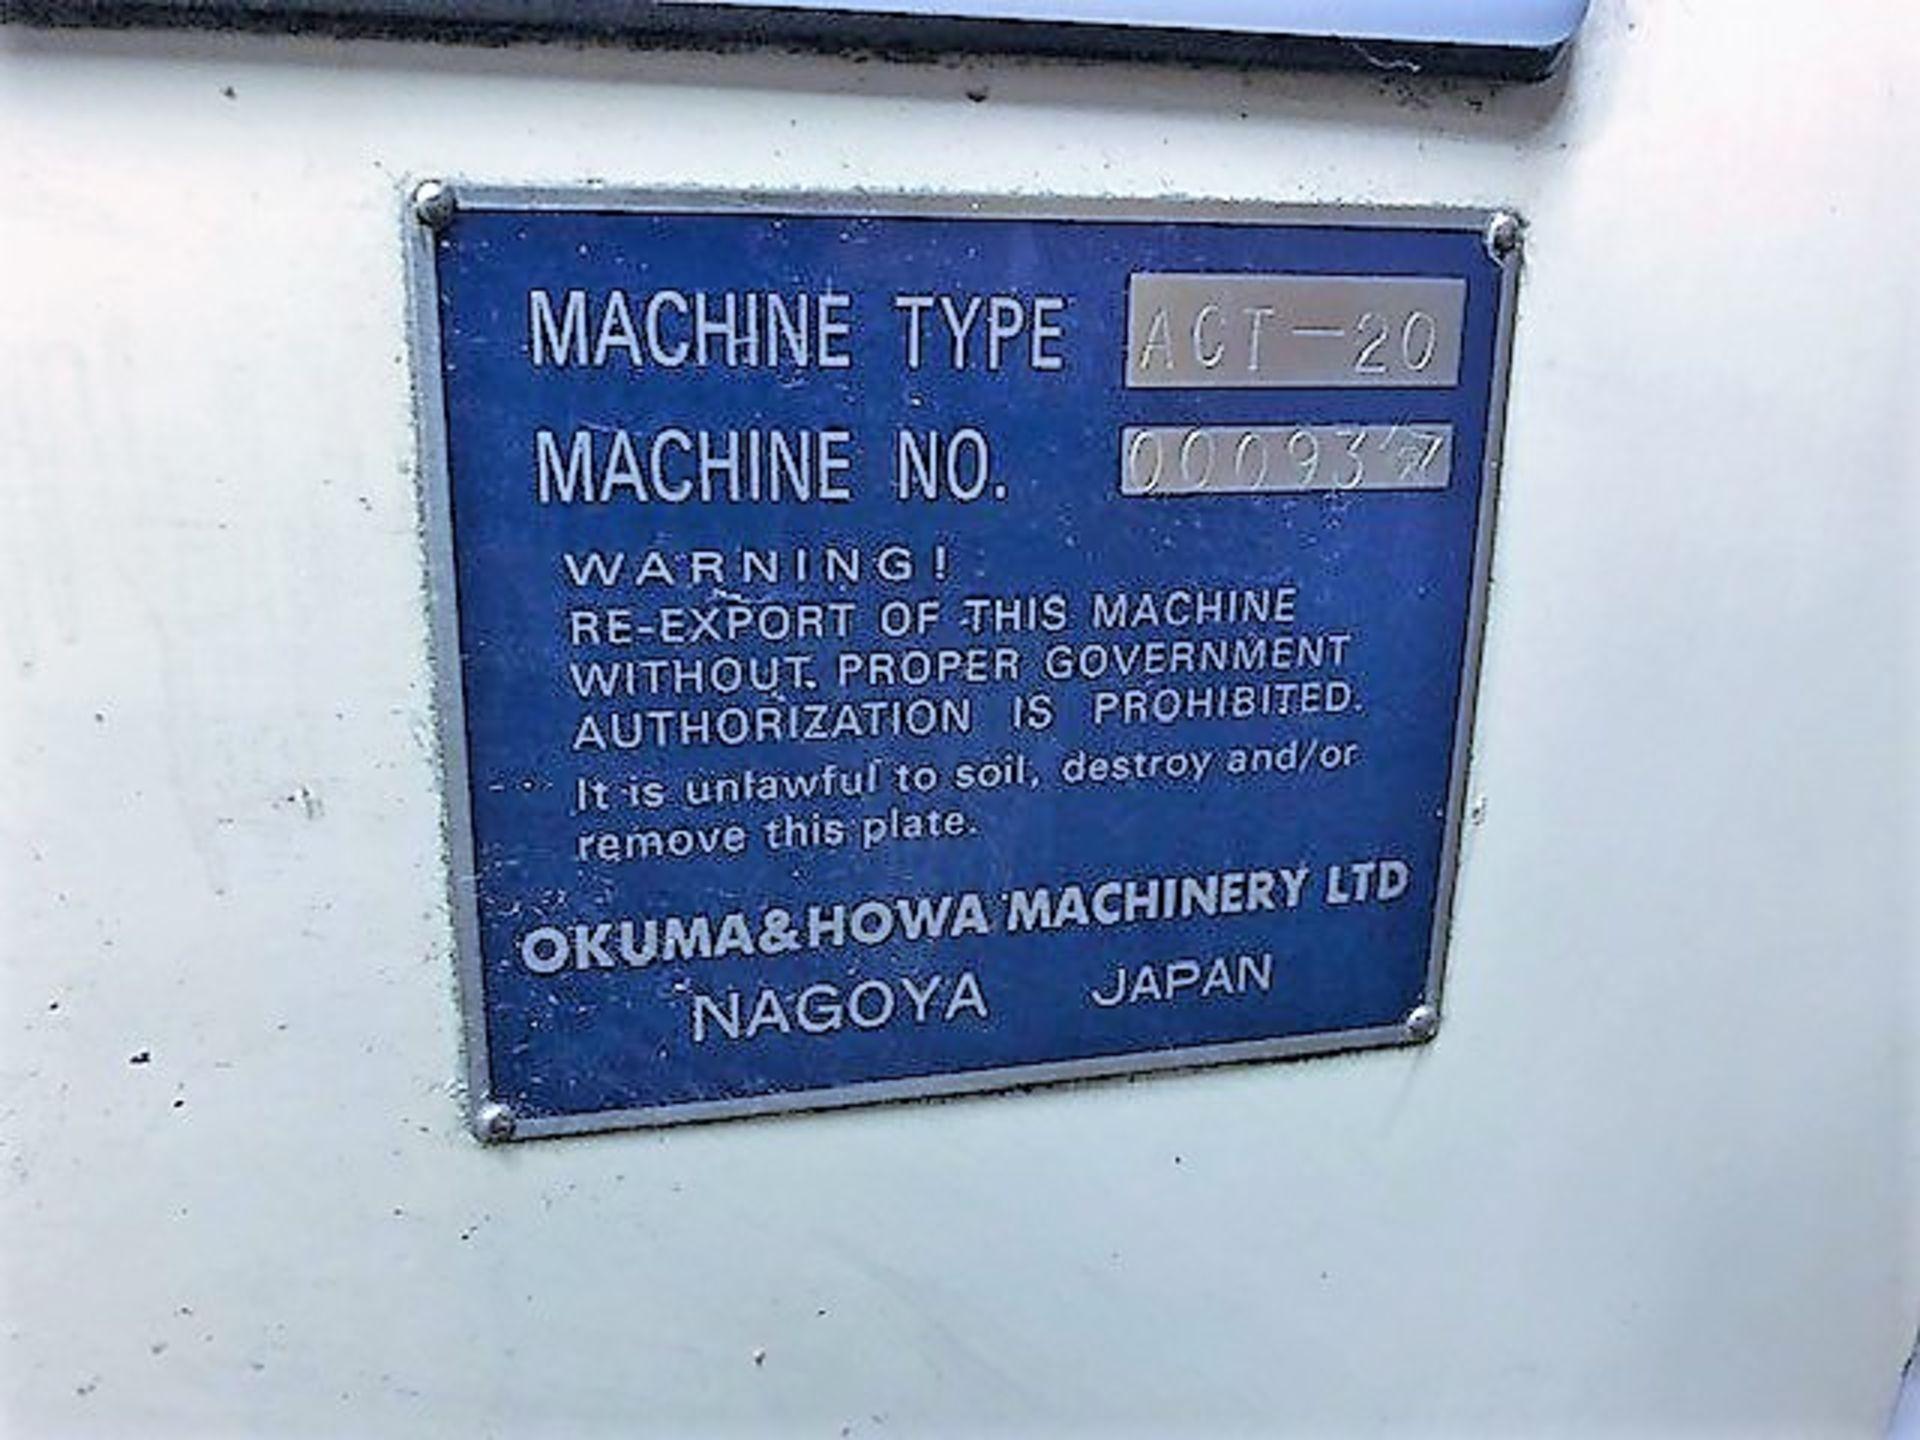 Lot 27B - Okuma & Howa ACT-20 CNC Lathe, S/N 00093